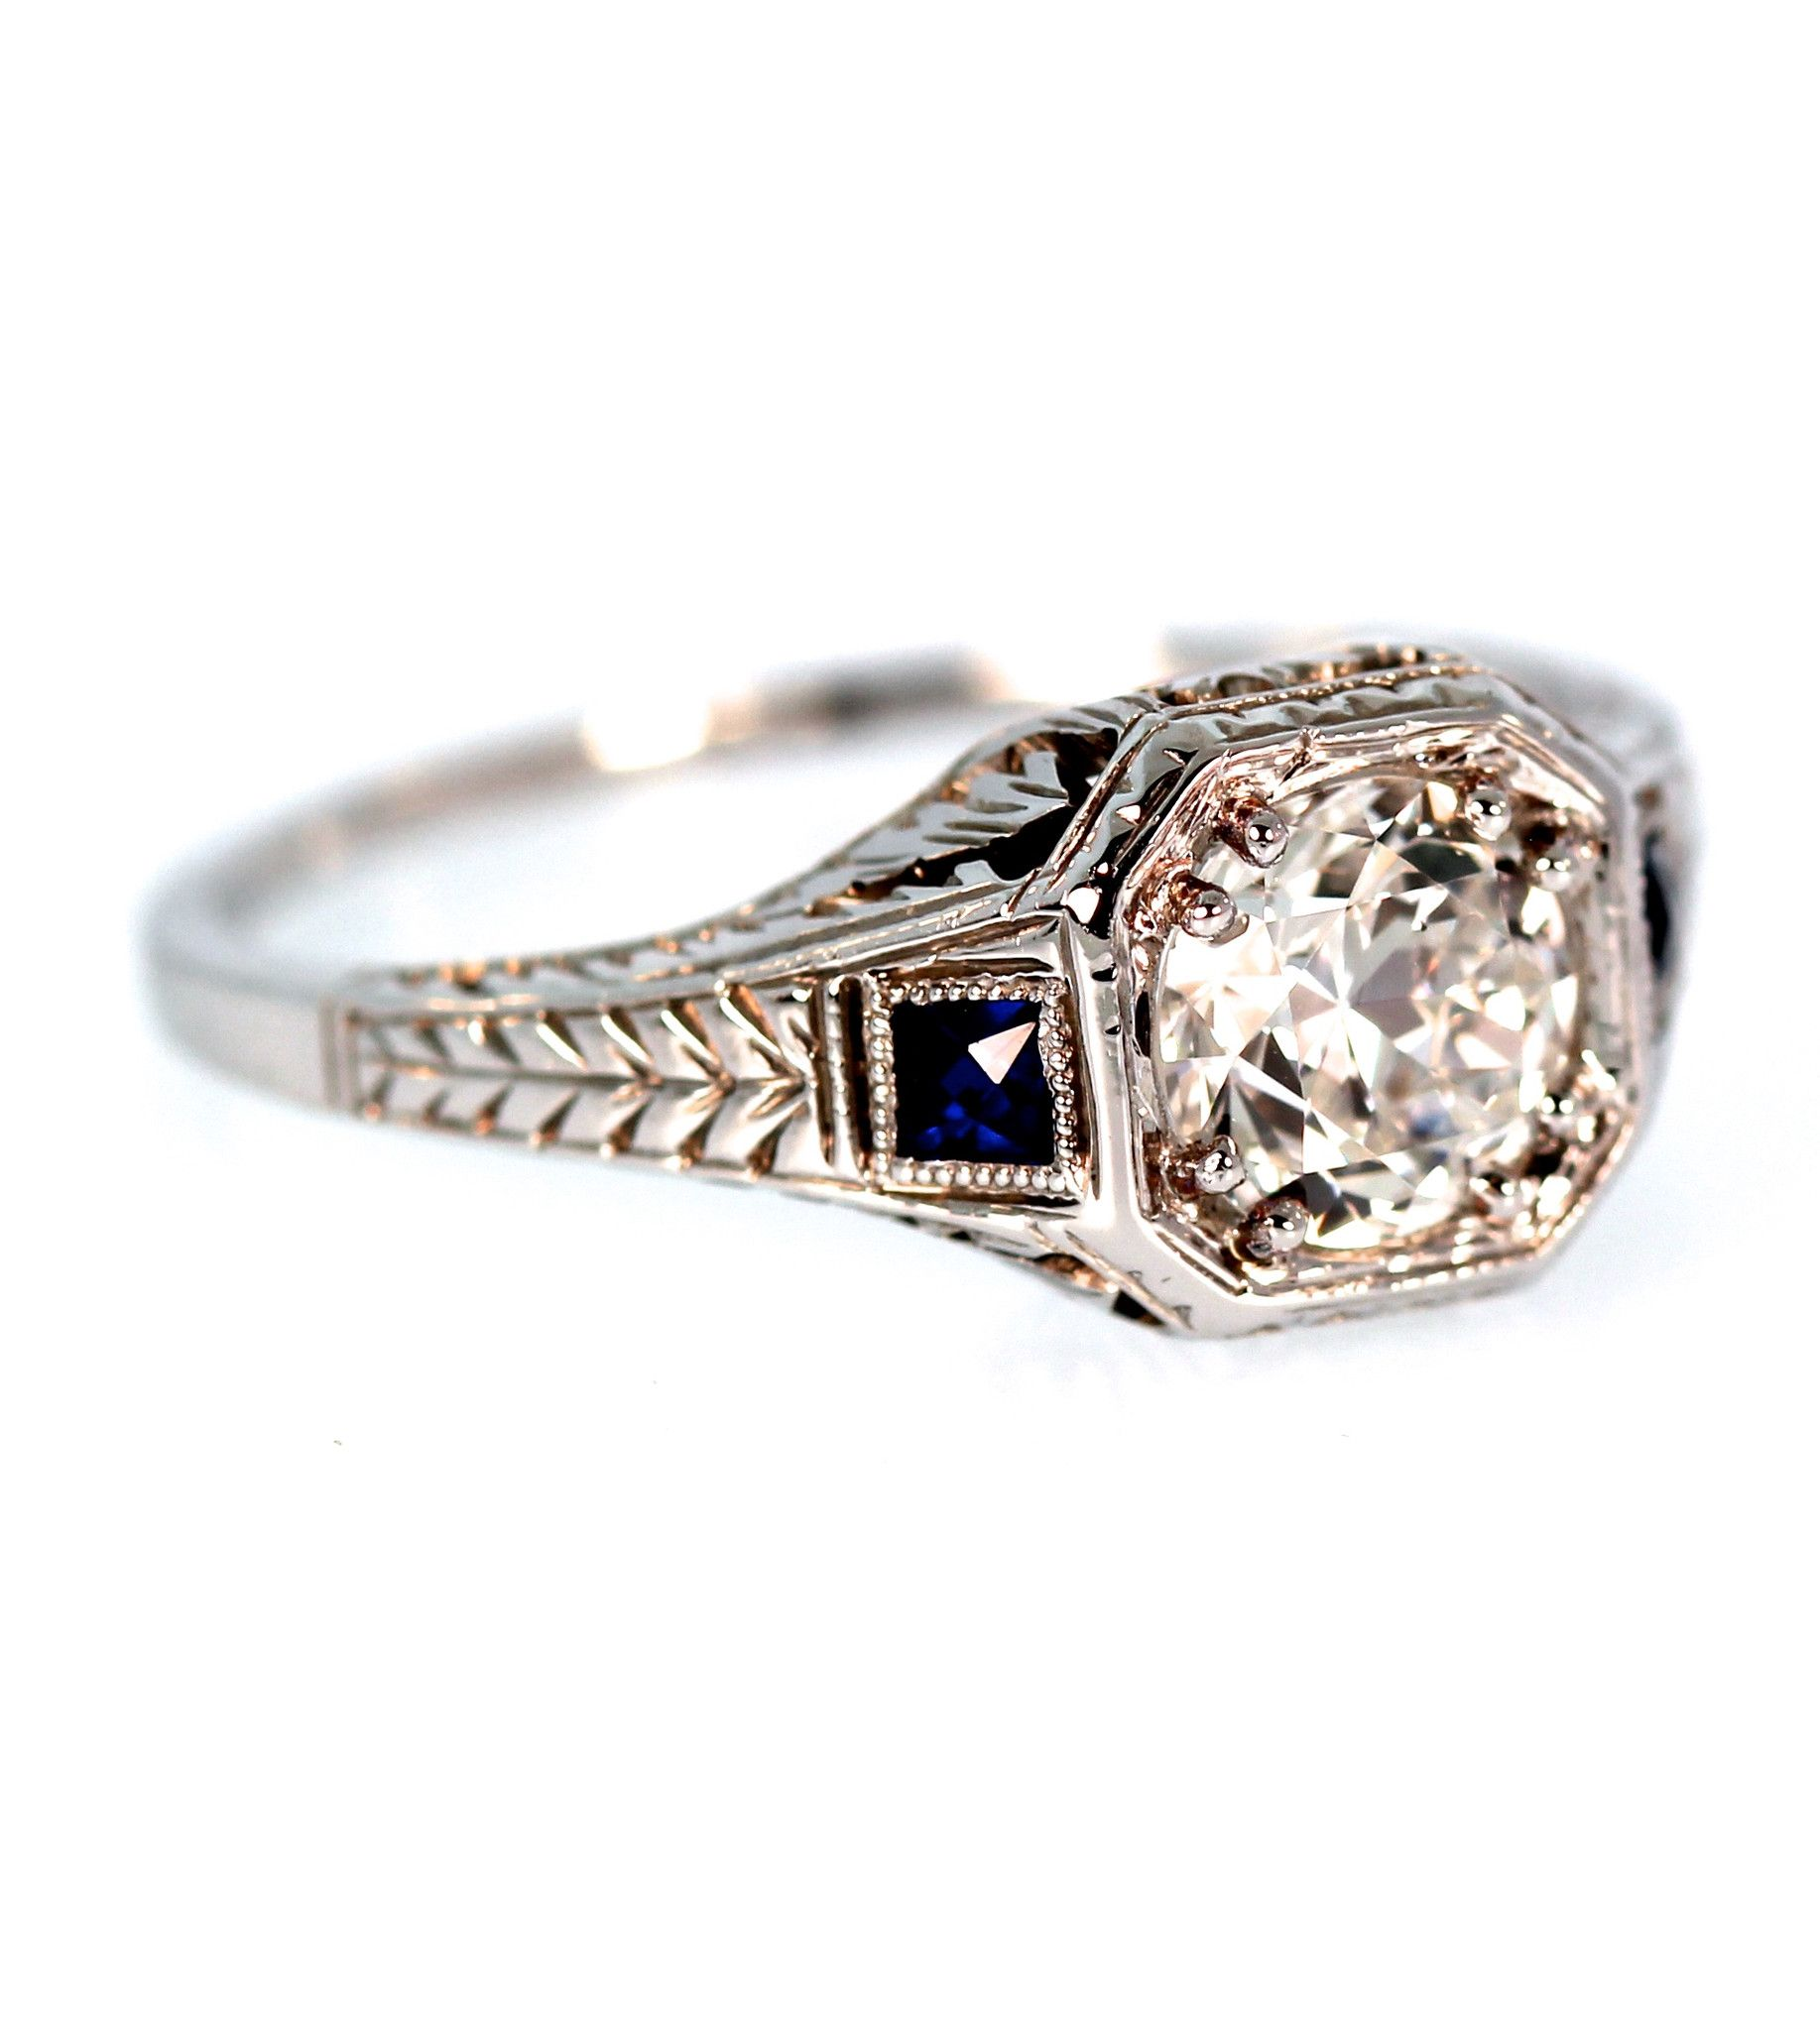 Art Deco Diamond Sapphire Ring Art Deco Diamond Sapphire Ring Art Deco Sapphire Ring Art Deco Diamond